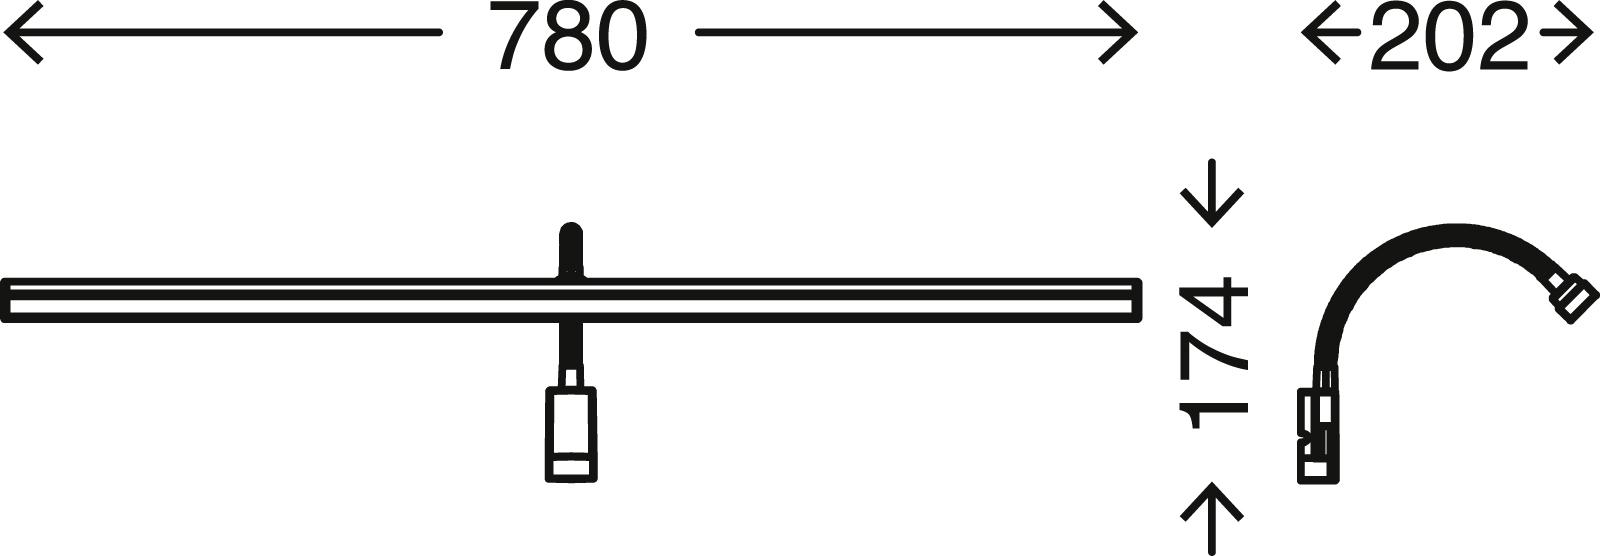 LED Spiegelleuchte, 78 cm, 8,5 W, Chrom